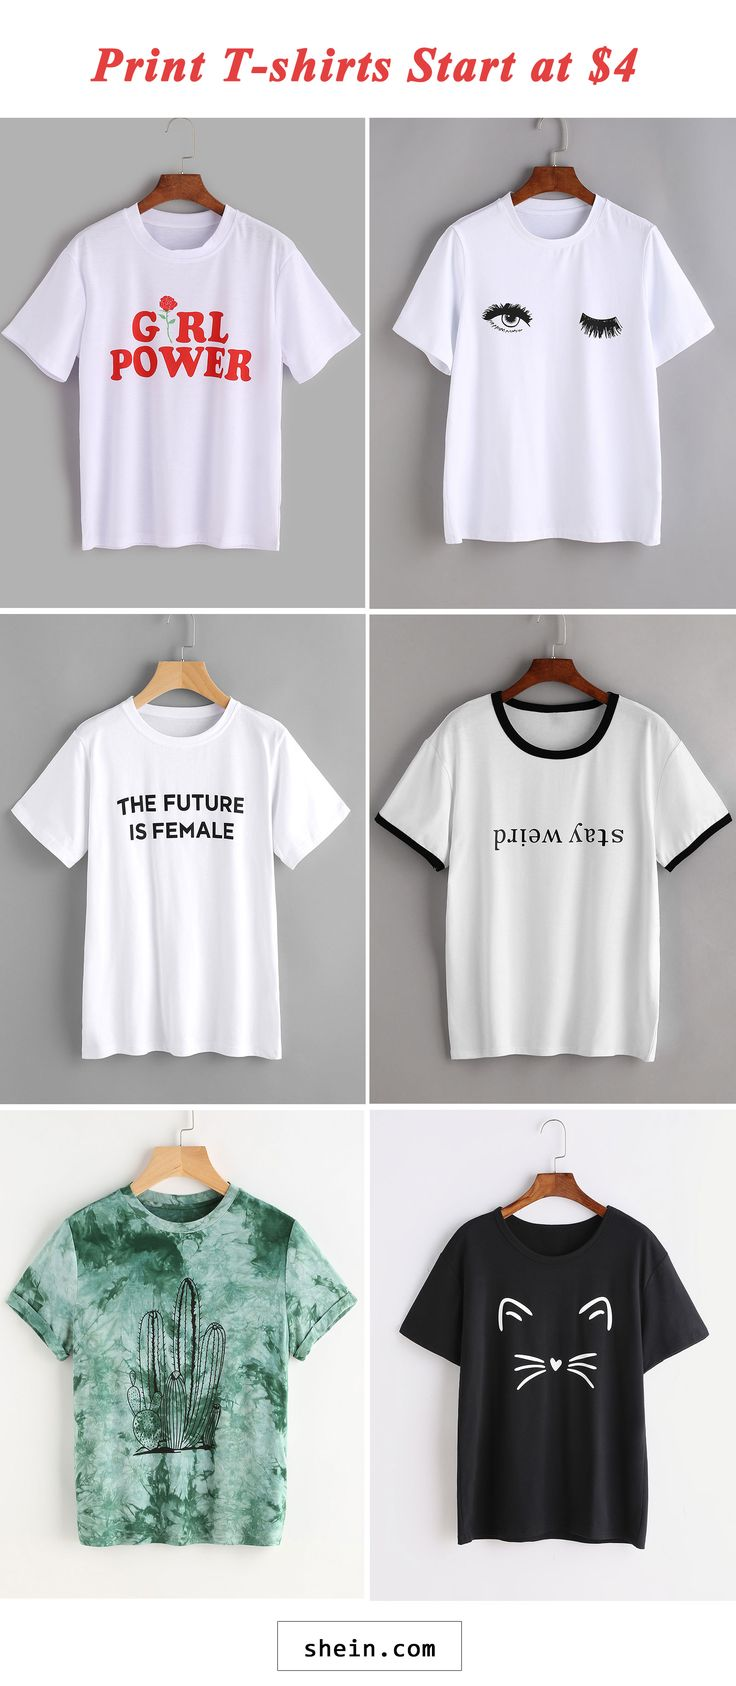 Print T-shirts start at $4